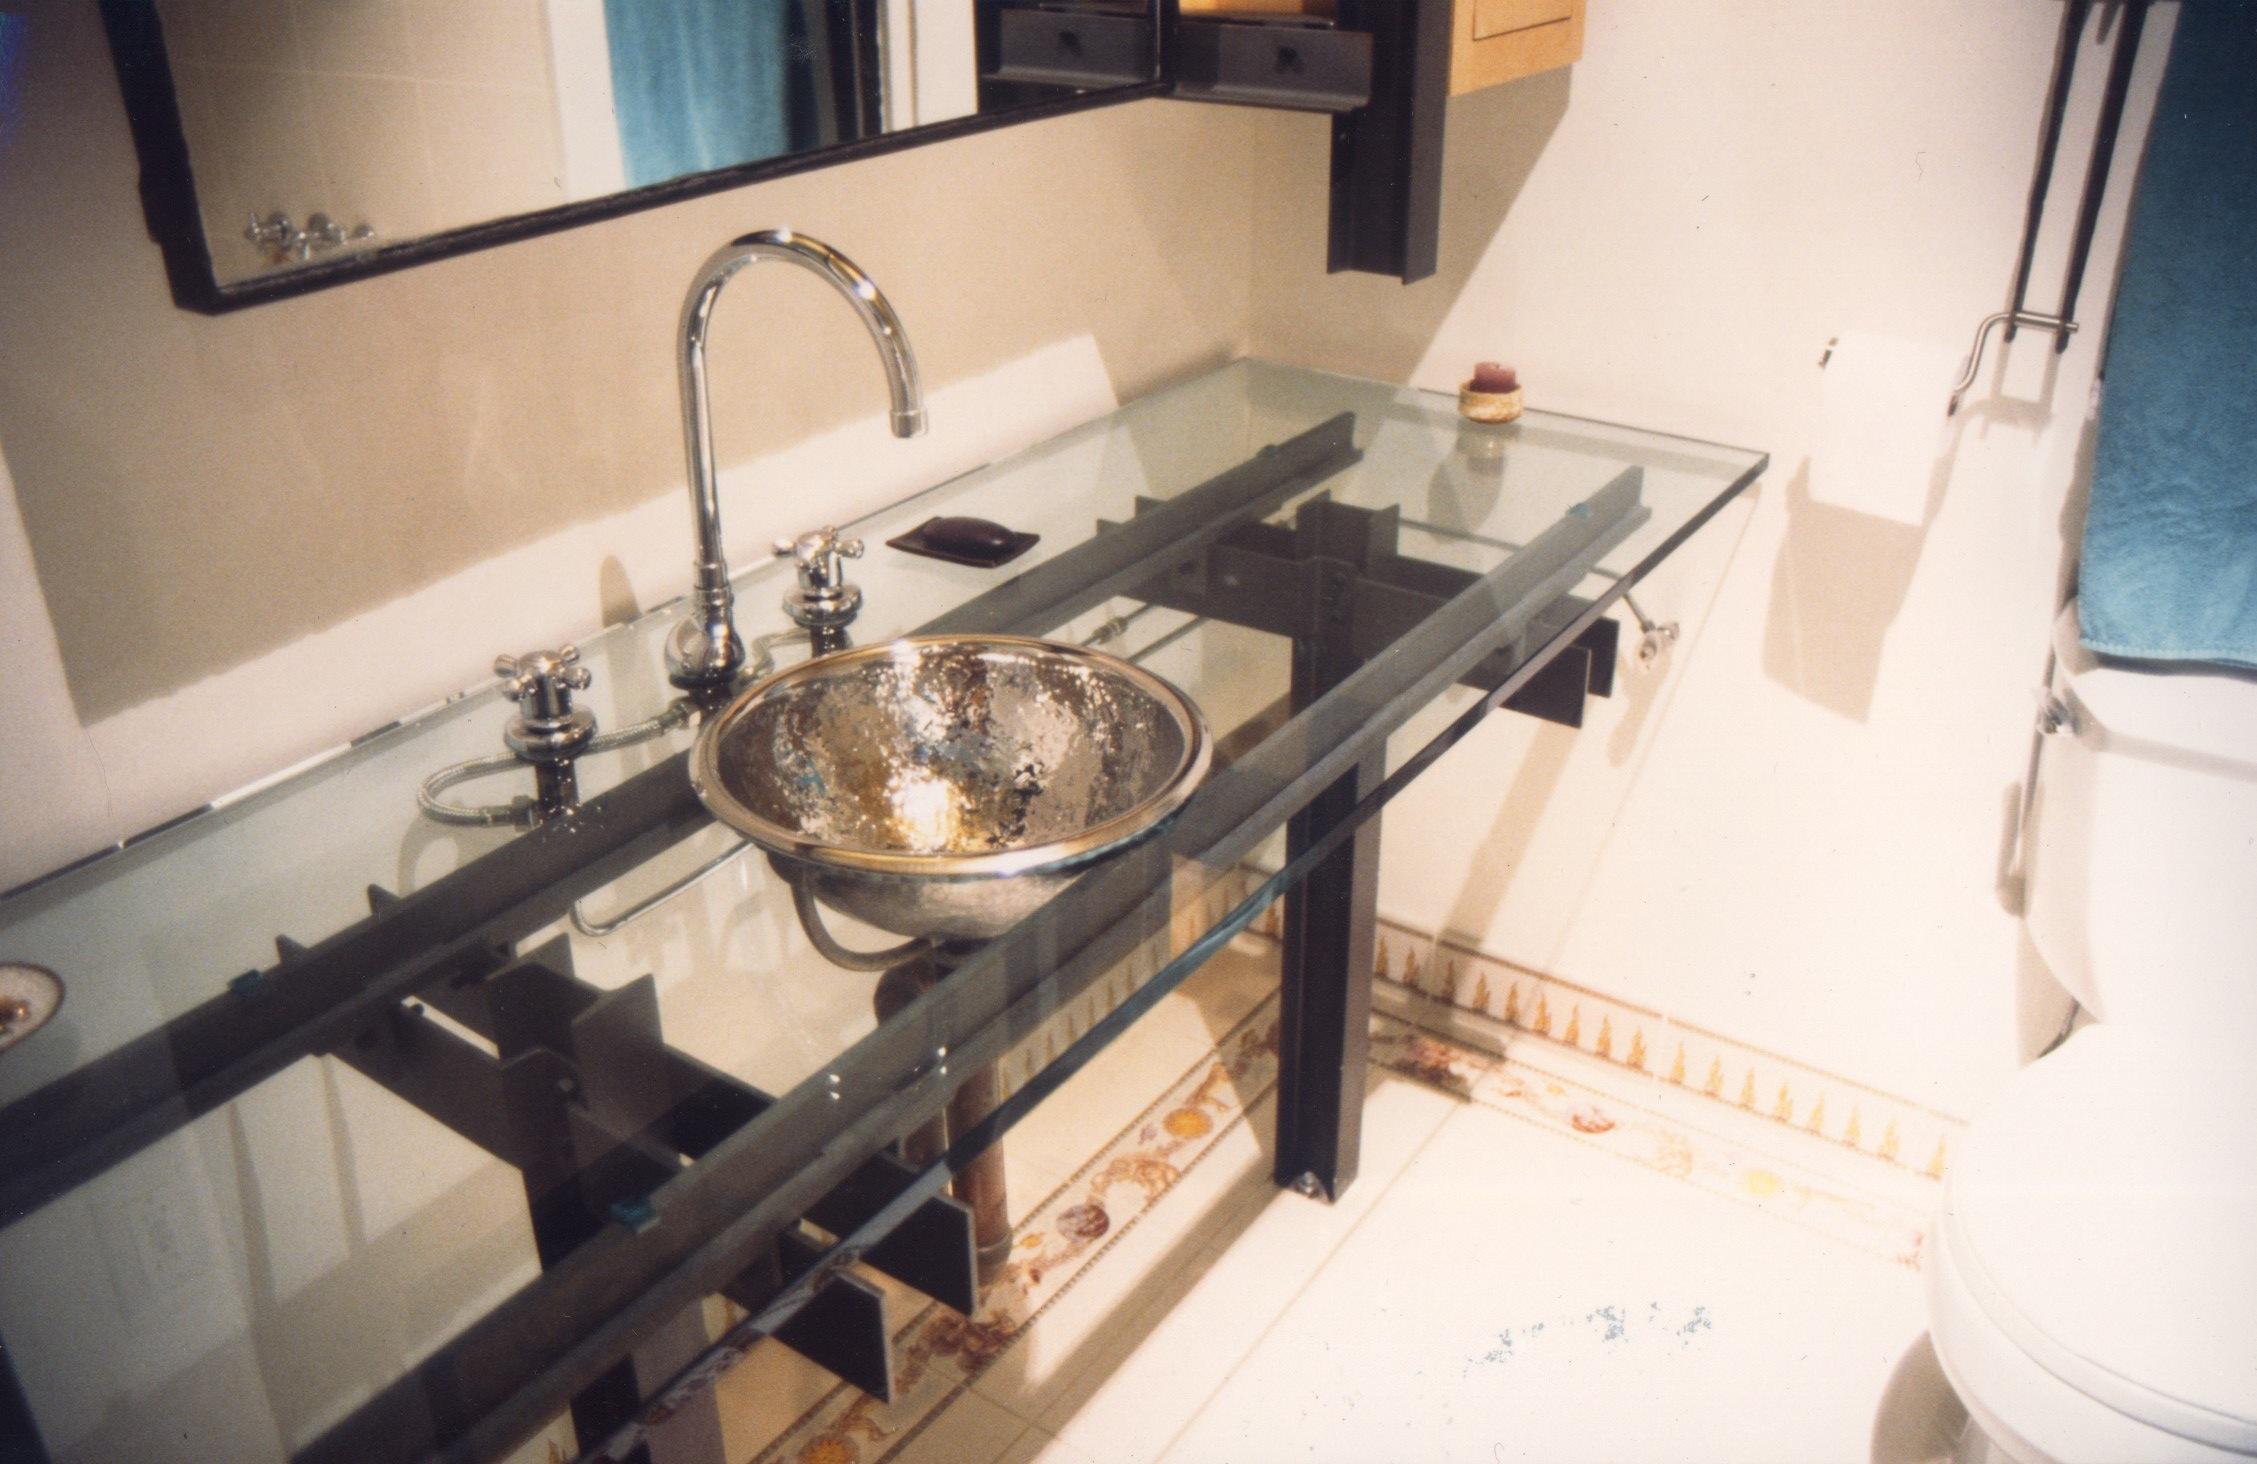 Bathroom Vanity - Sandblasted and Epoxied Steel and Glass Sculpture